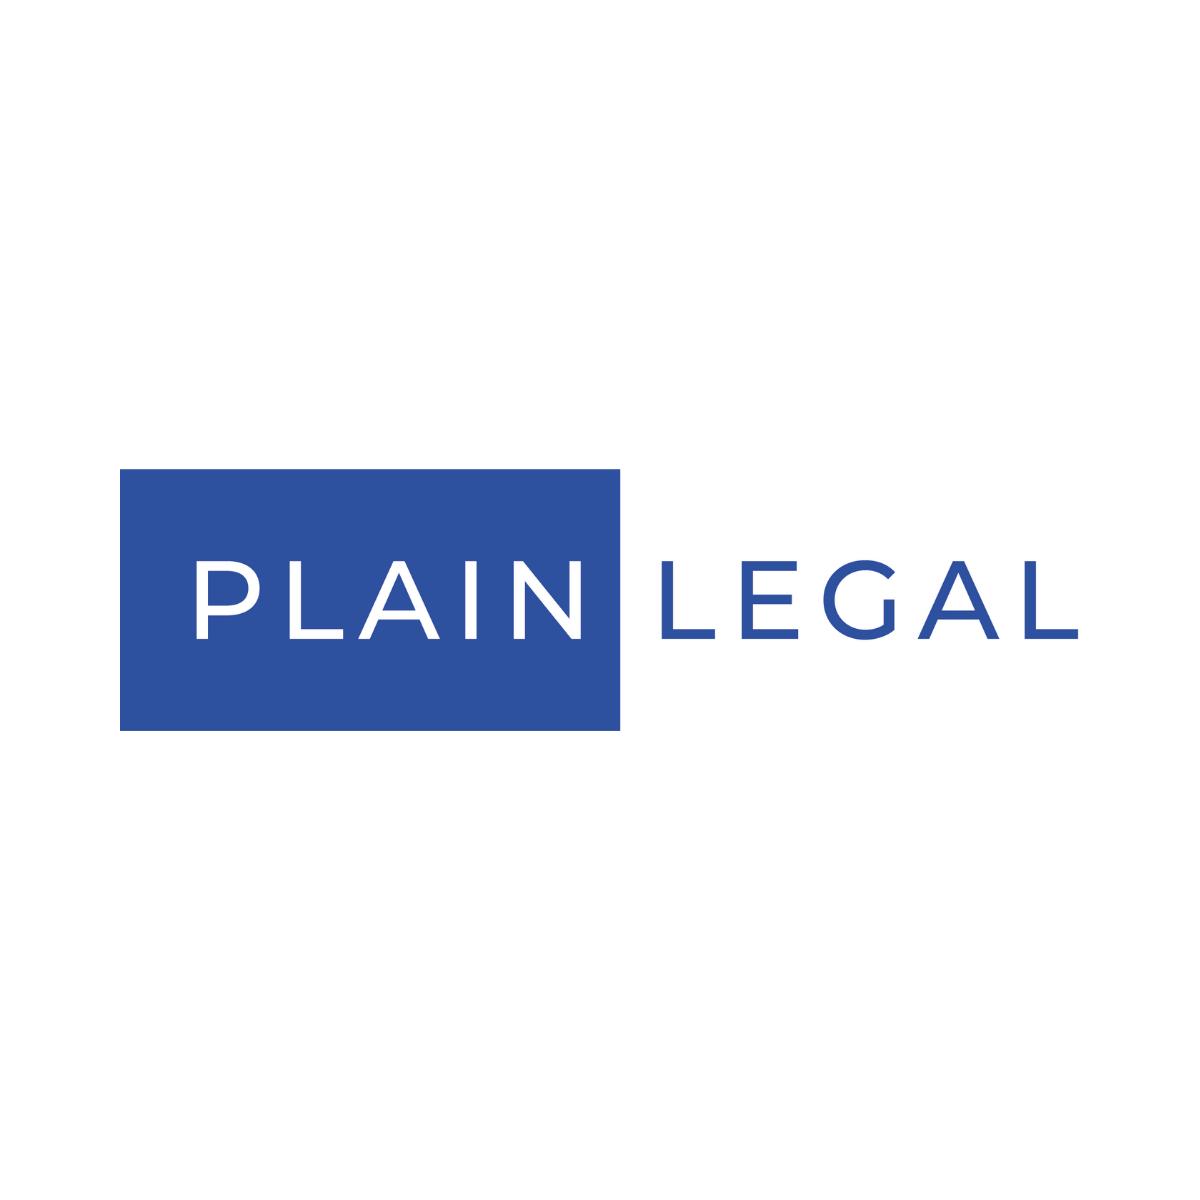 Logo ontwerp in opdracht van Plain Legal